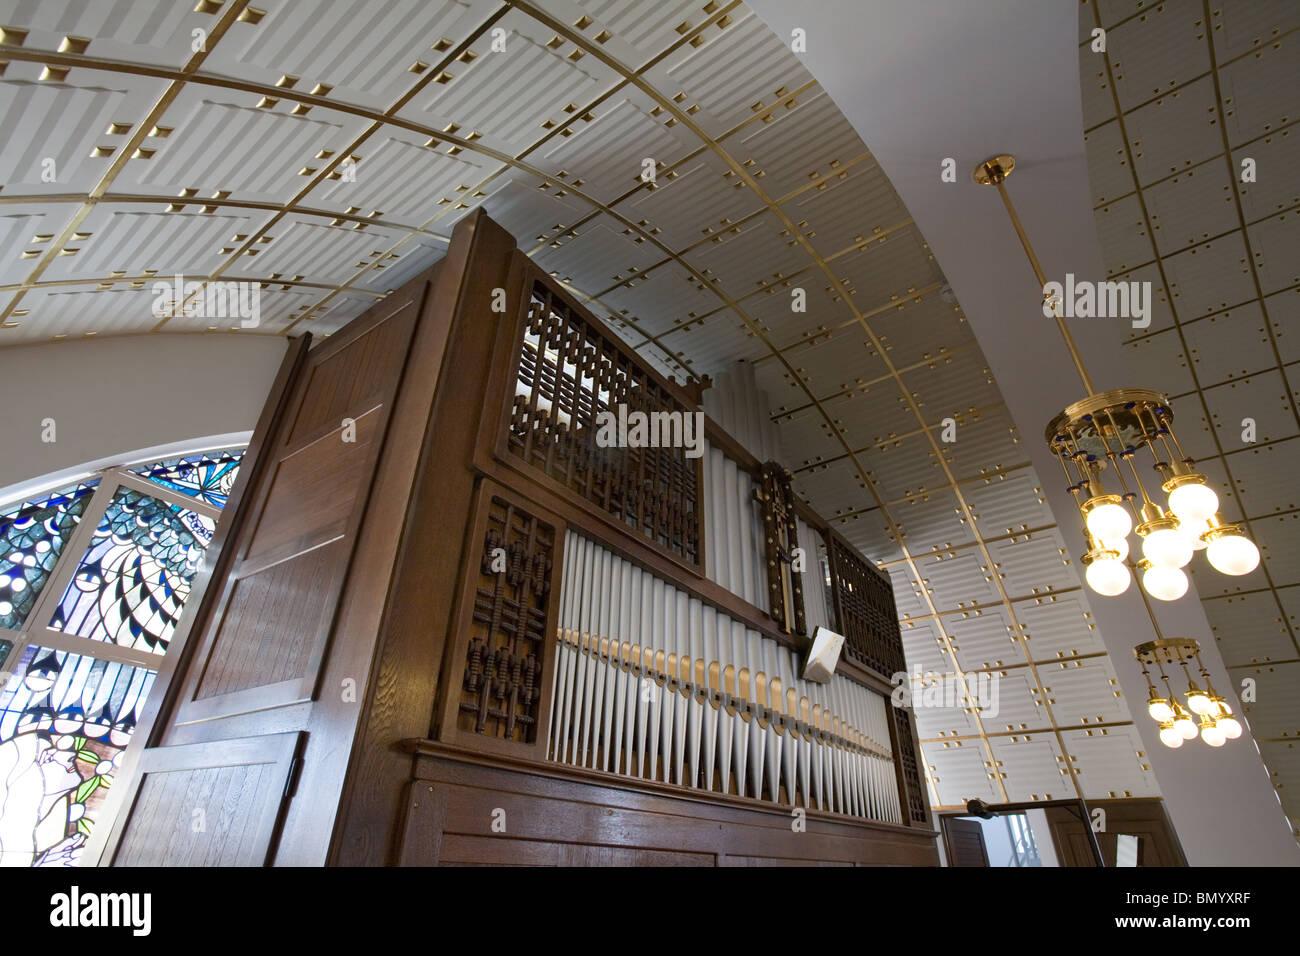 Otto Wagner's St Leopold Church, Vienna, Austria - Stock Image